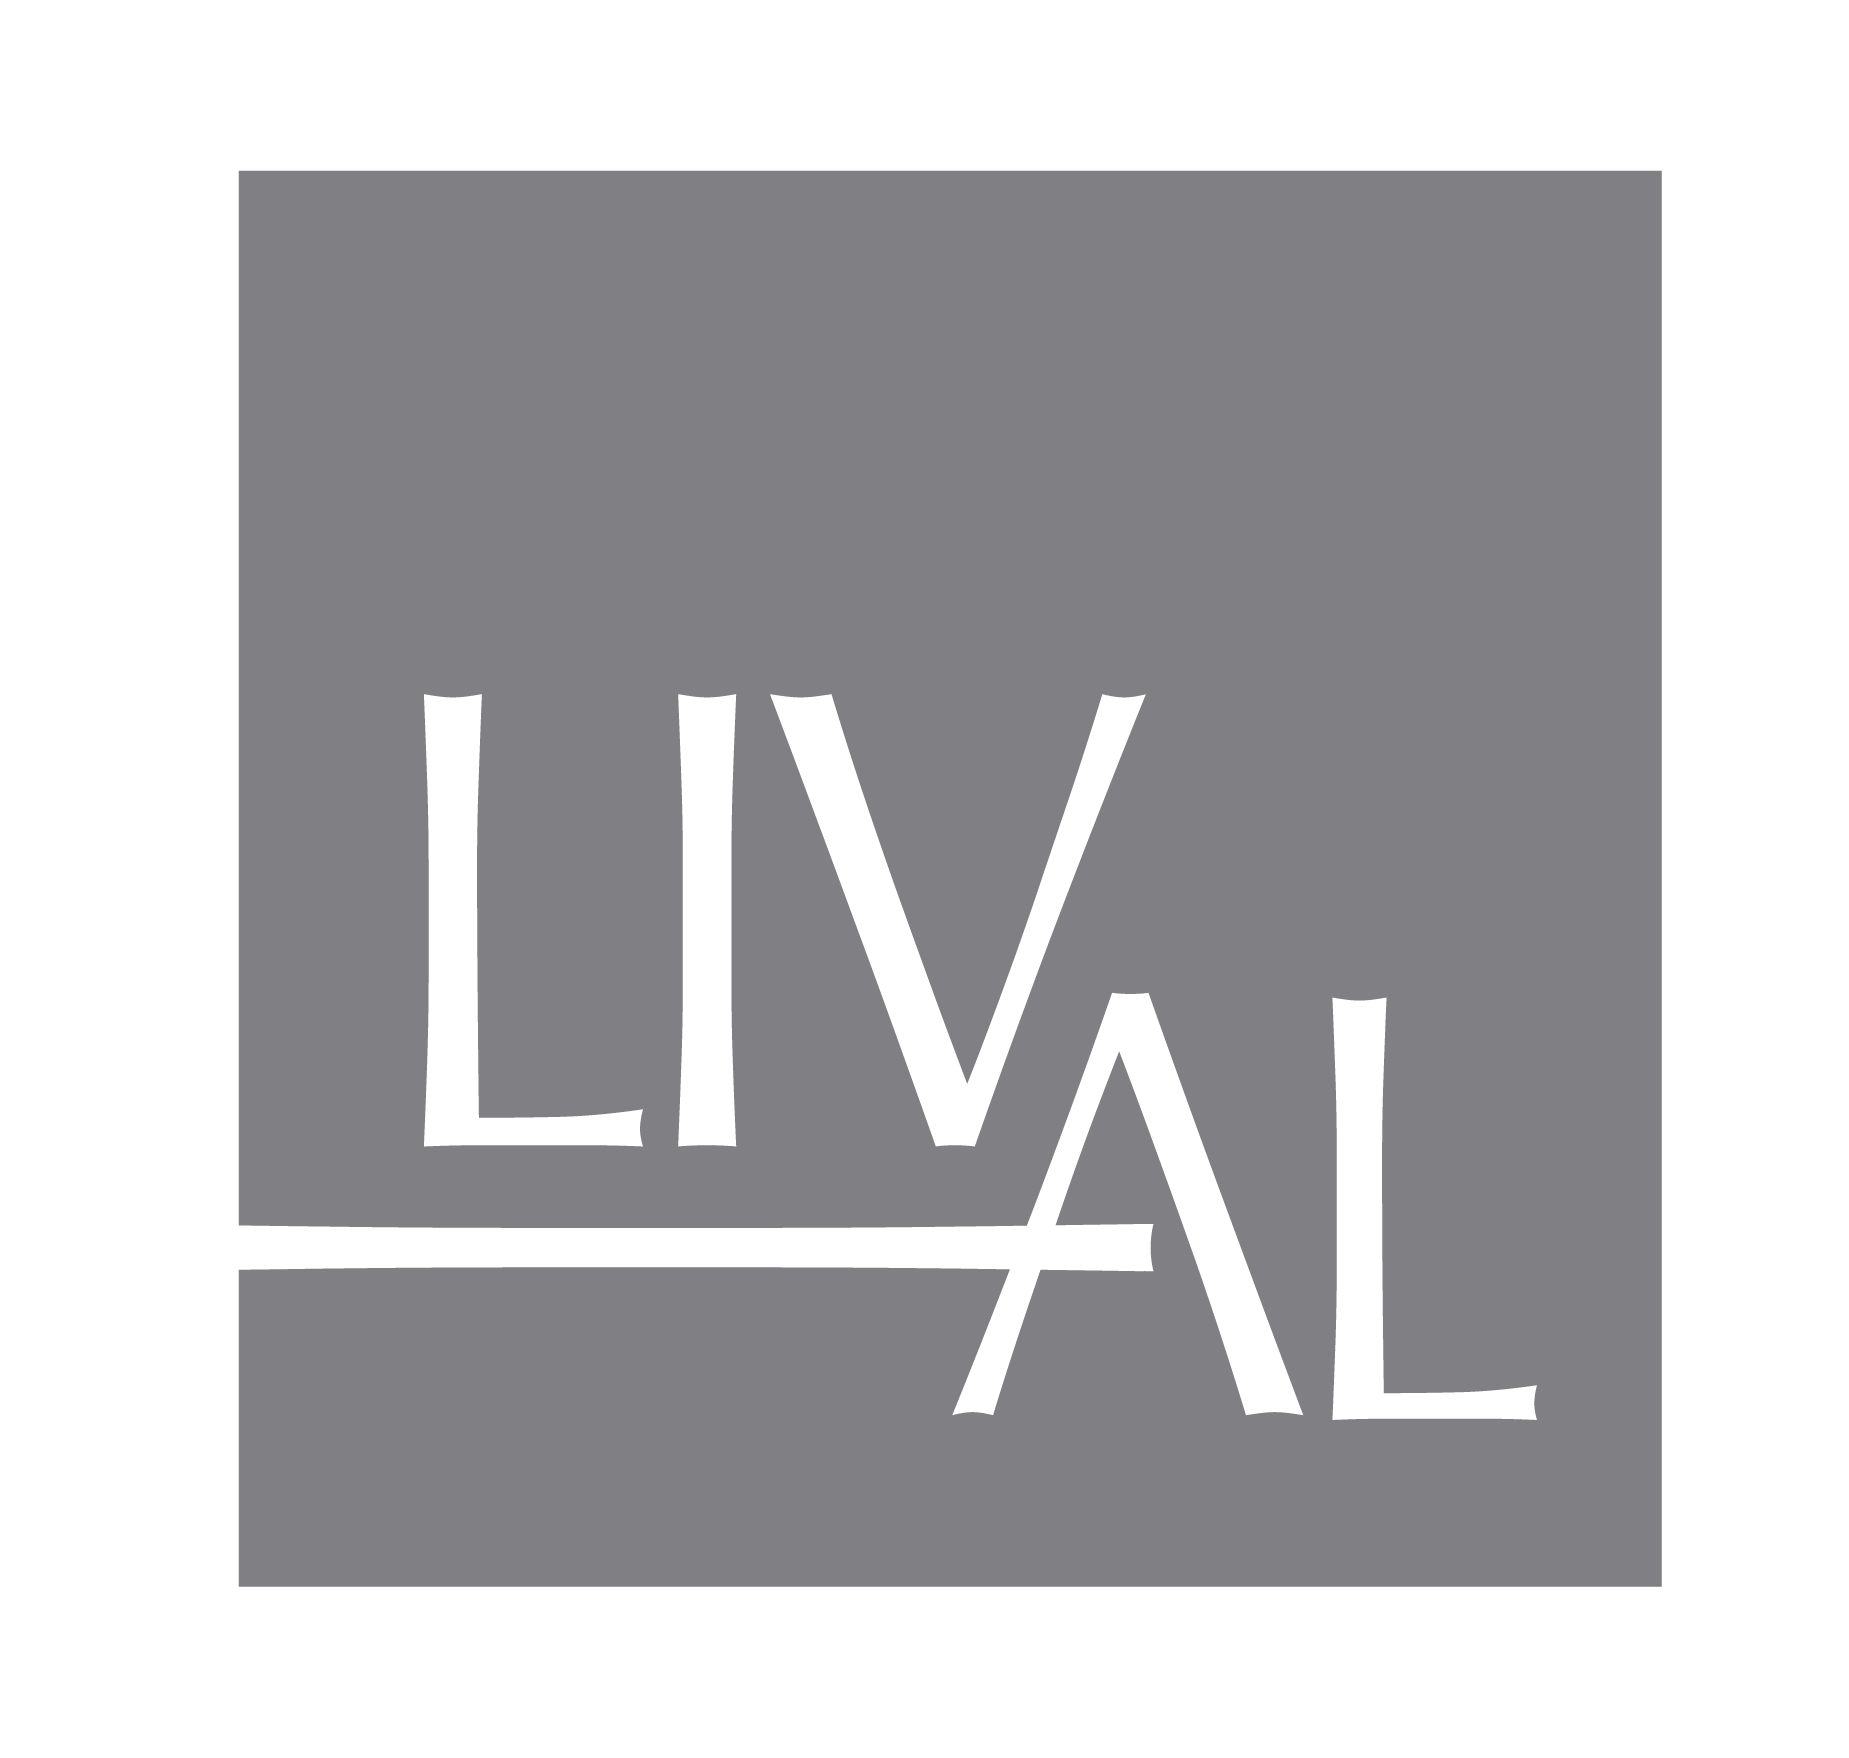 Lival.co